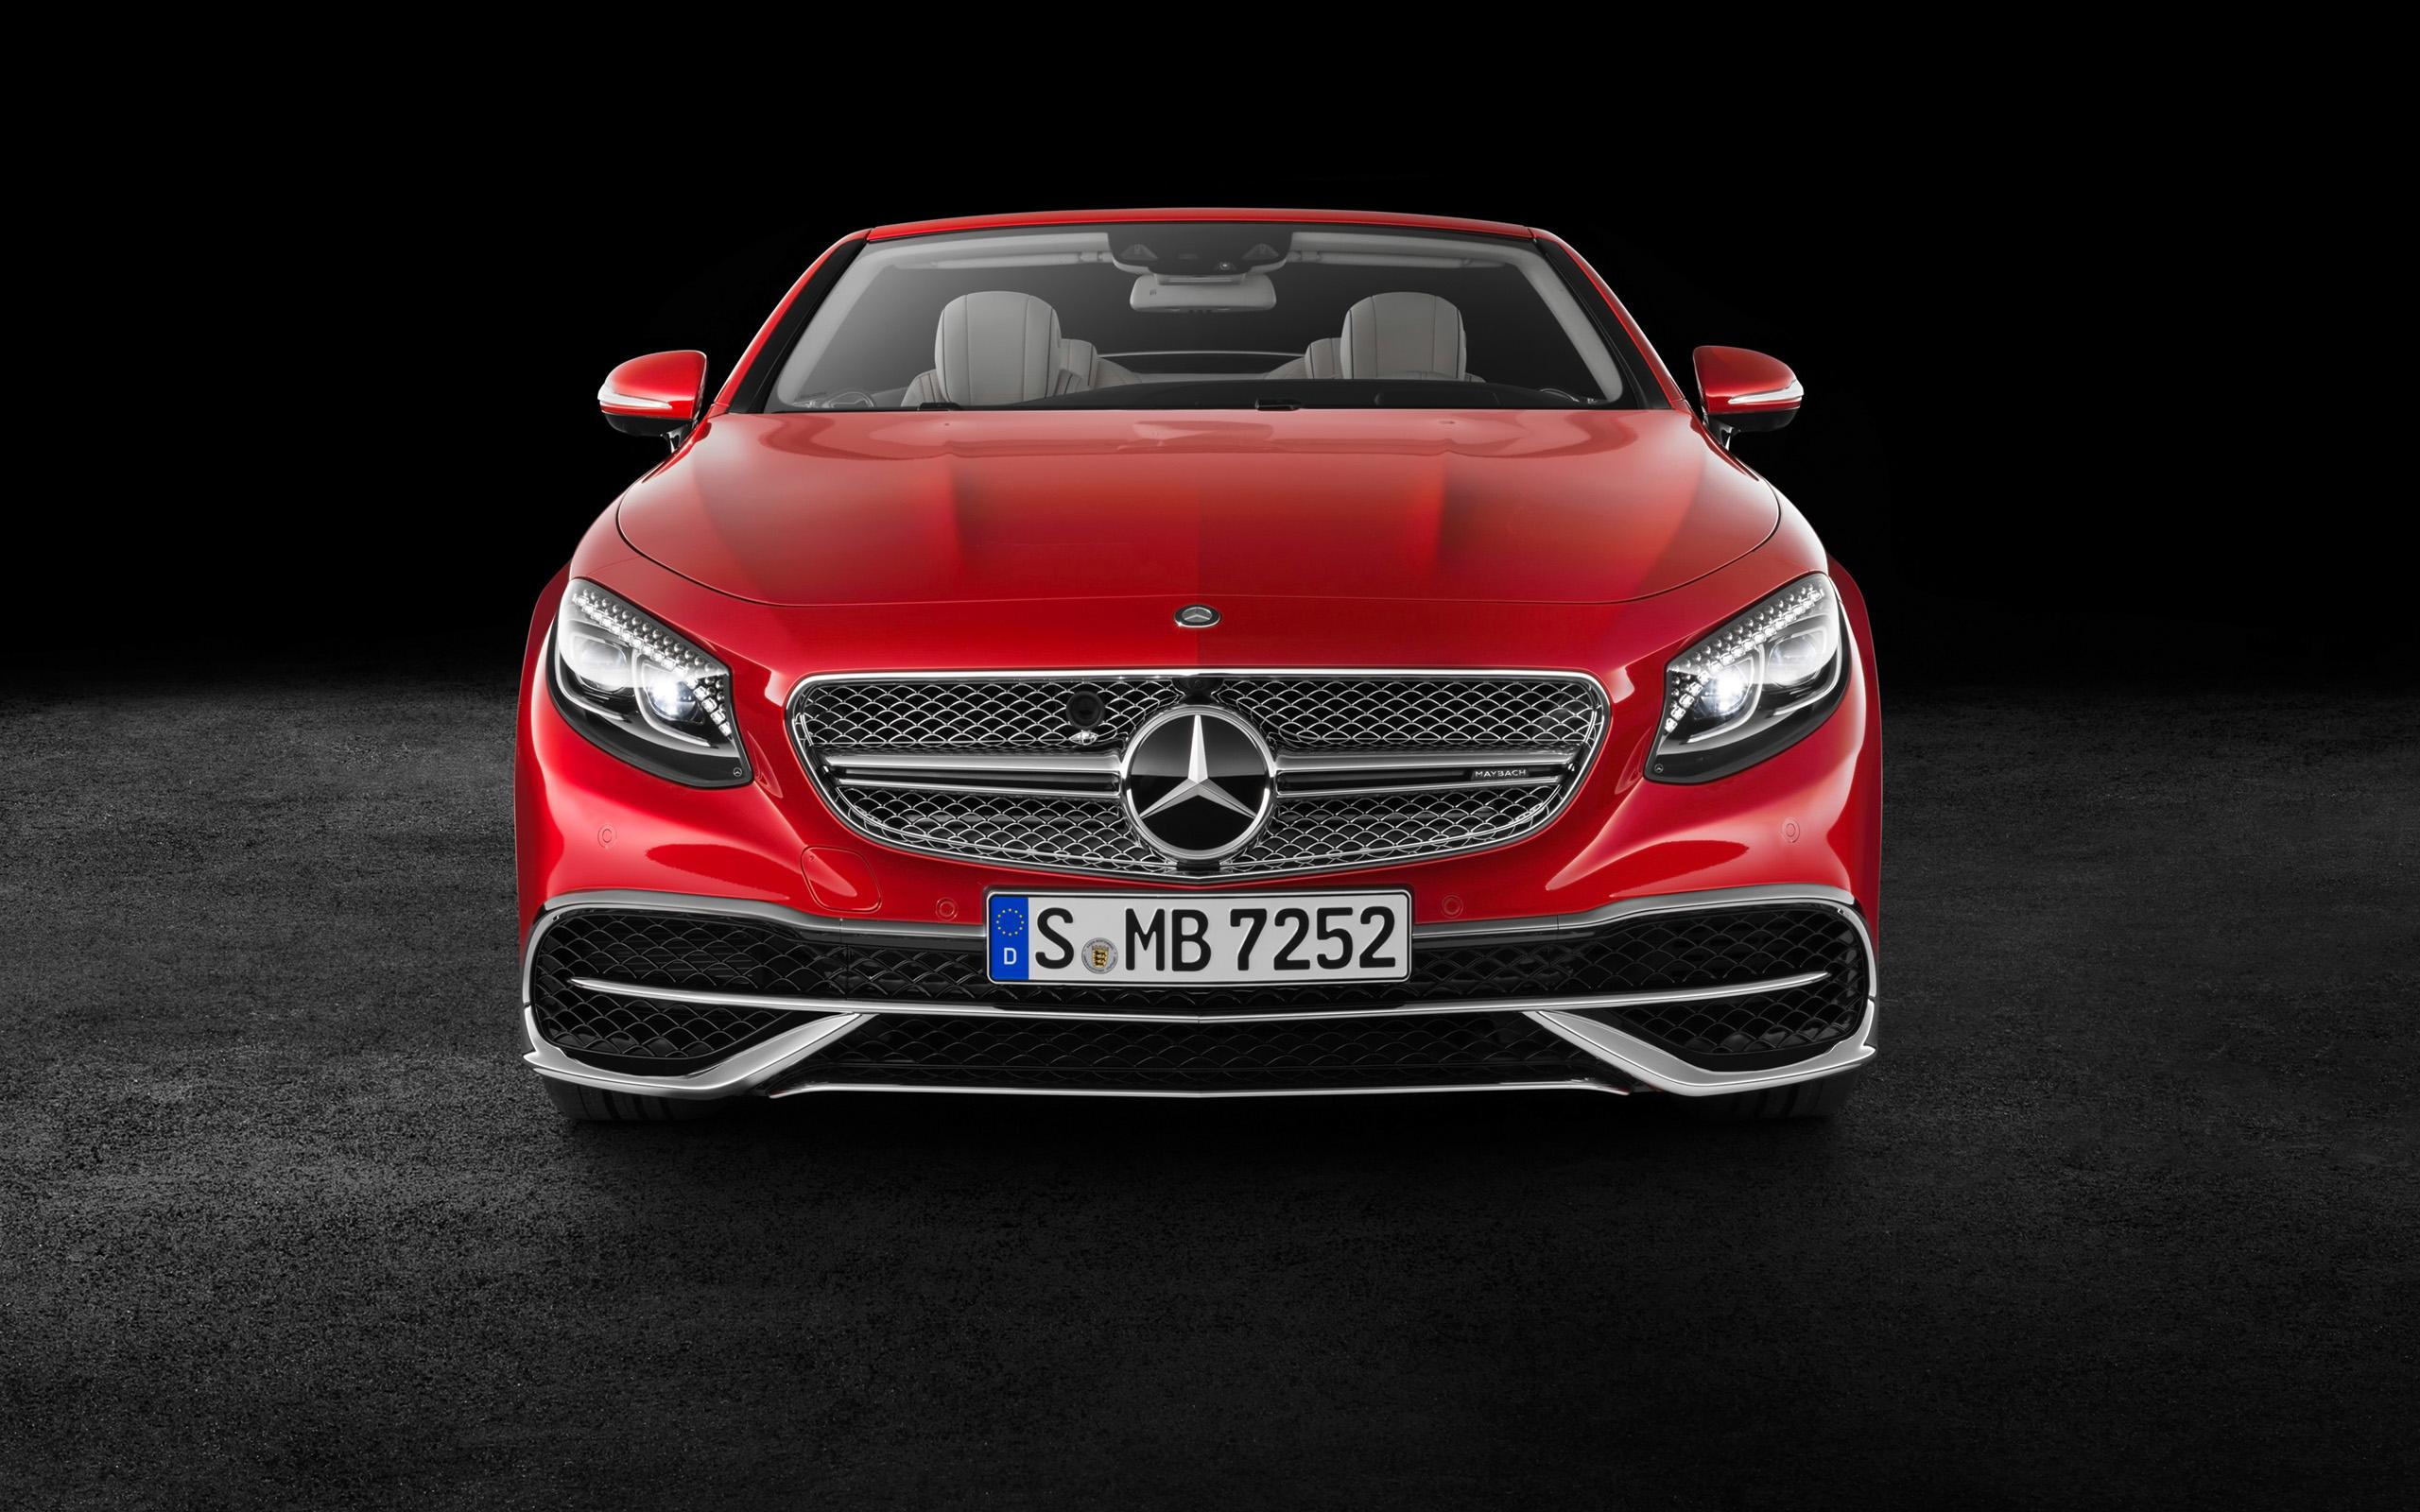 Mercedes Maybach S Cabriolet Hd Wallpaper